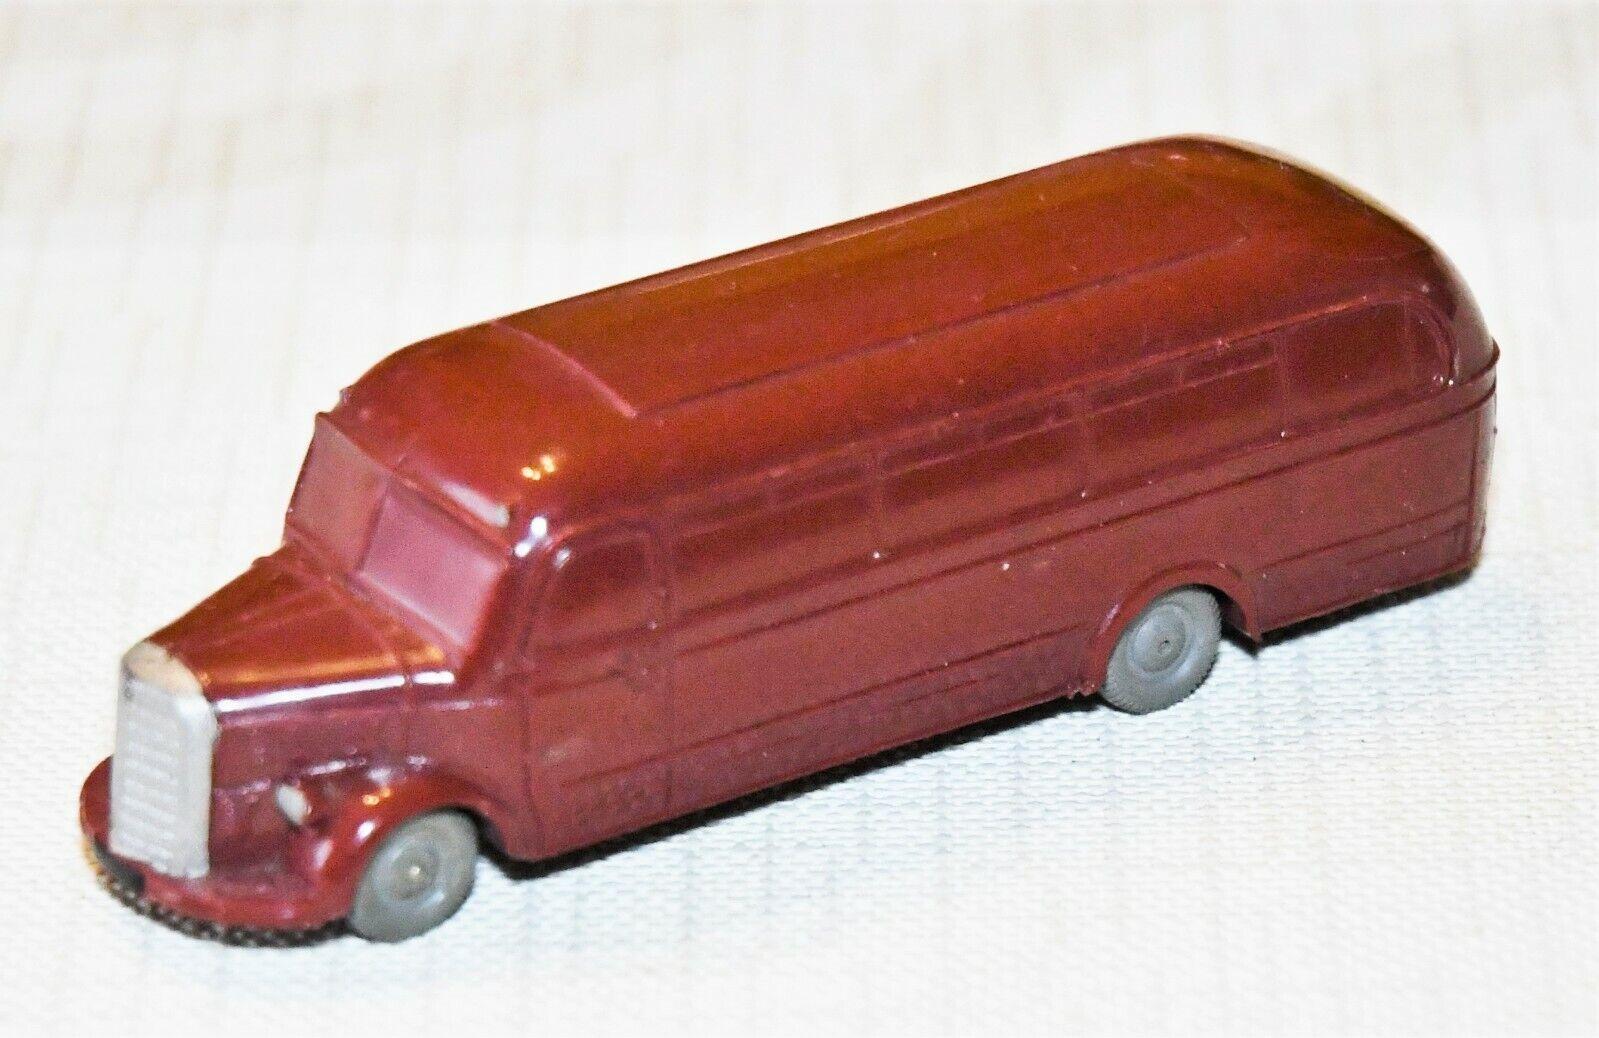 Märklin 860 8 E Mercedes Omnibus dunkelrot H0 1 87, 1953, selten